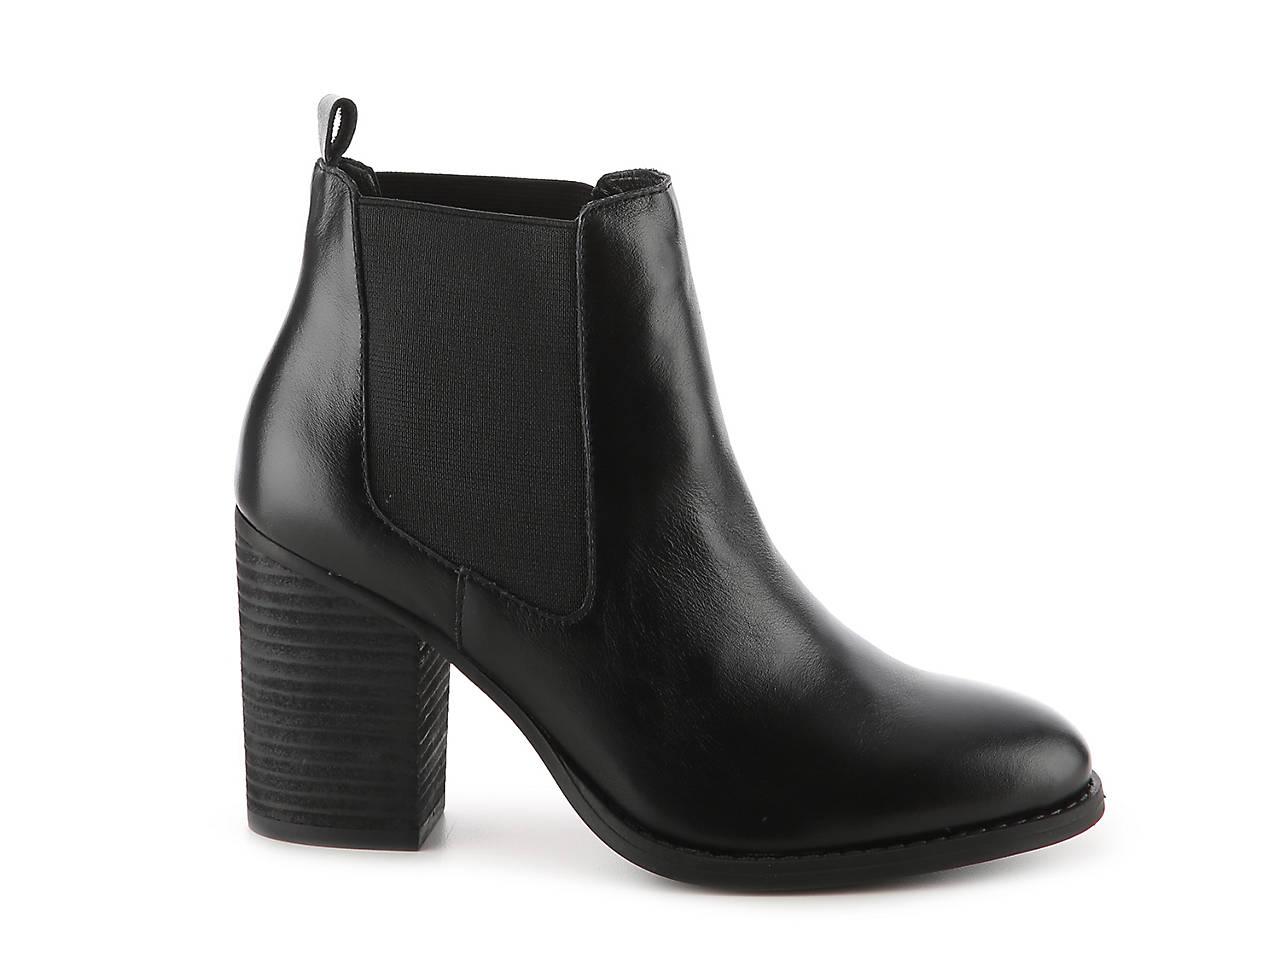 d785642392e Steve Madden Troyan Chelsea Boot Women s Shoes